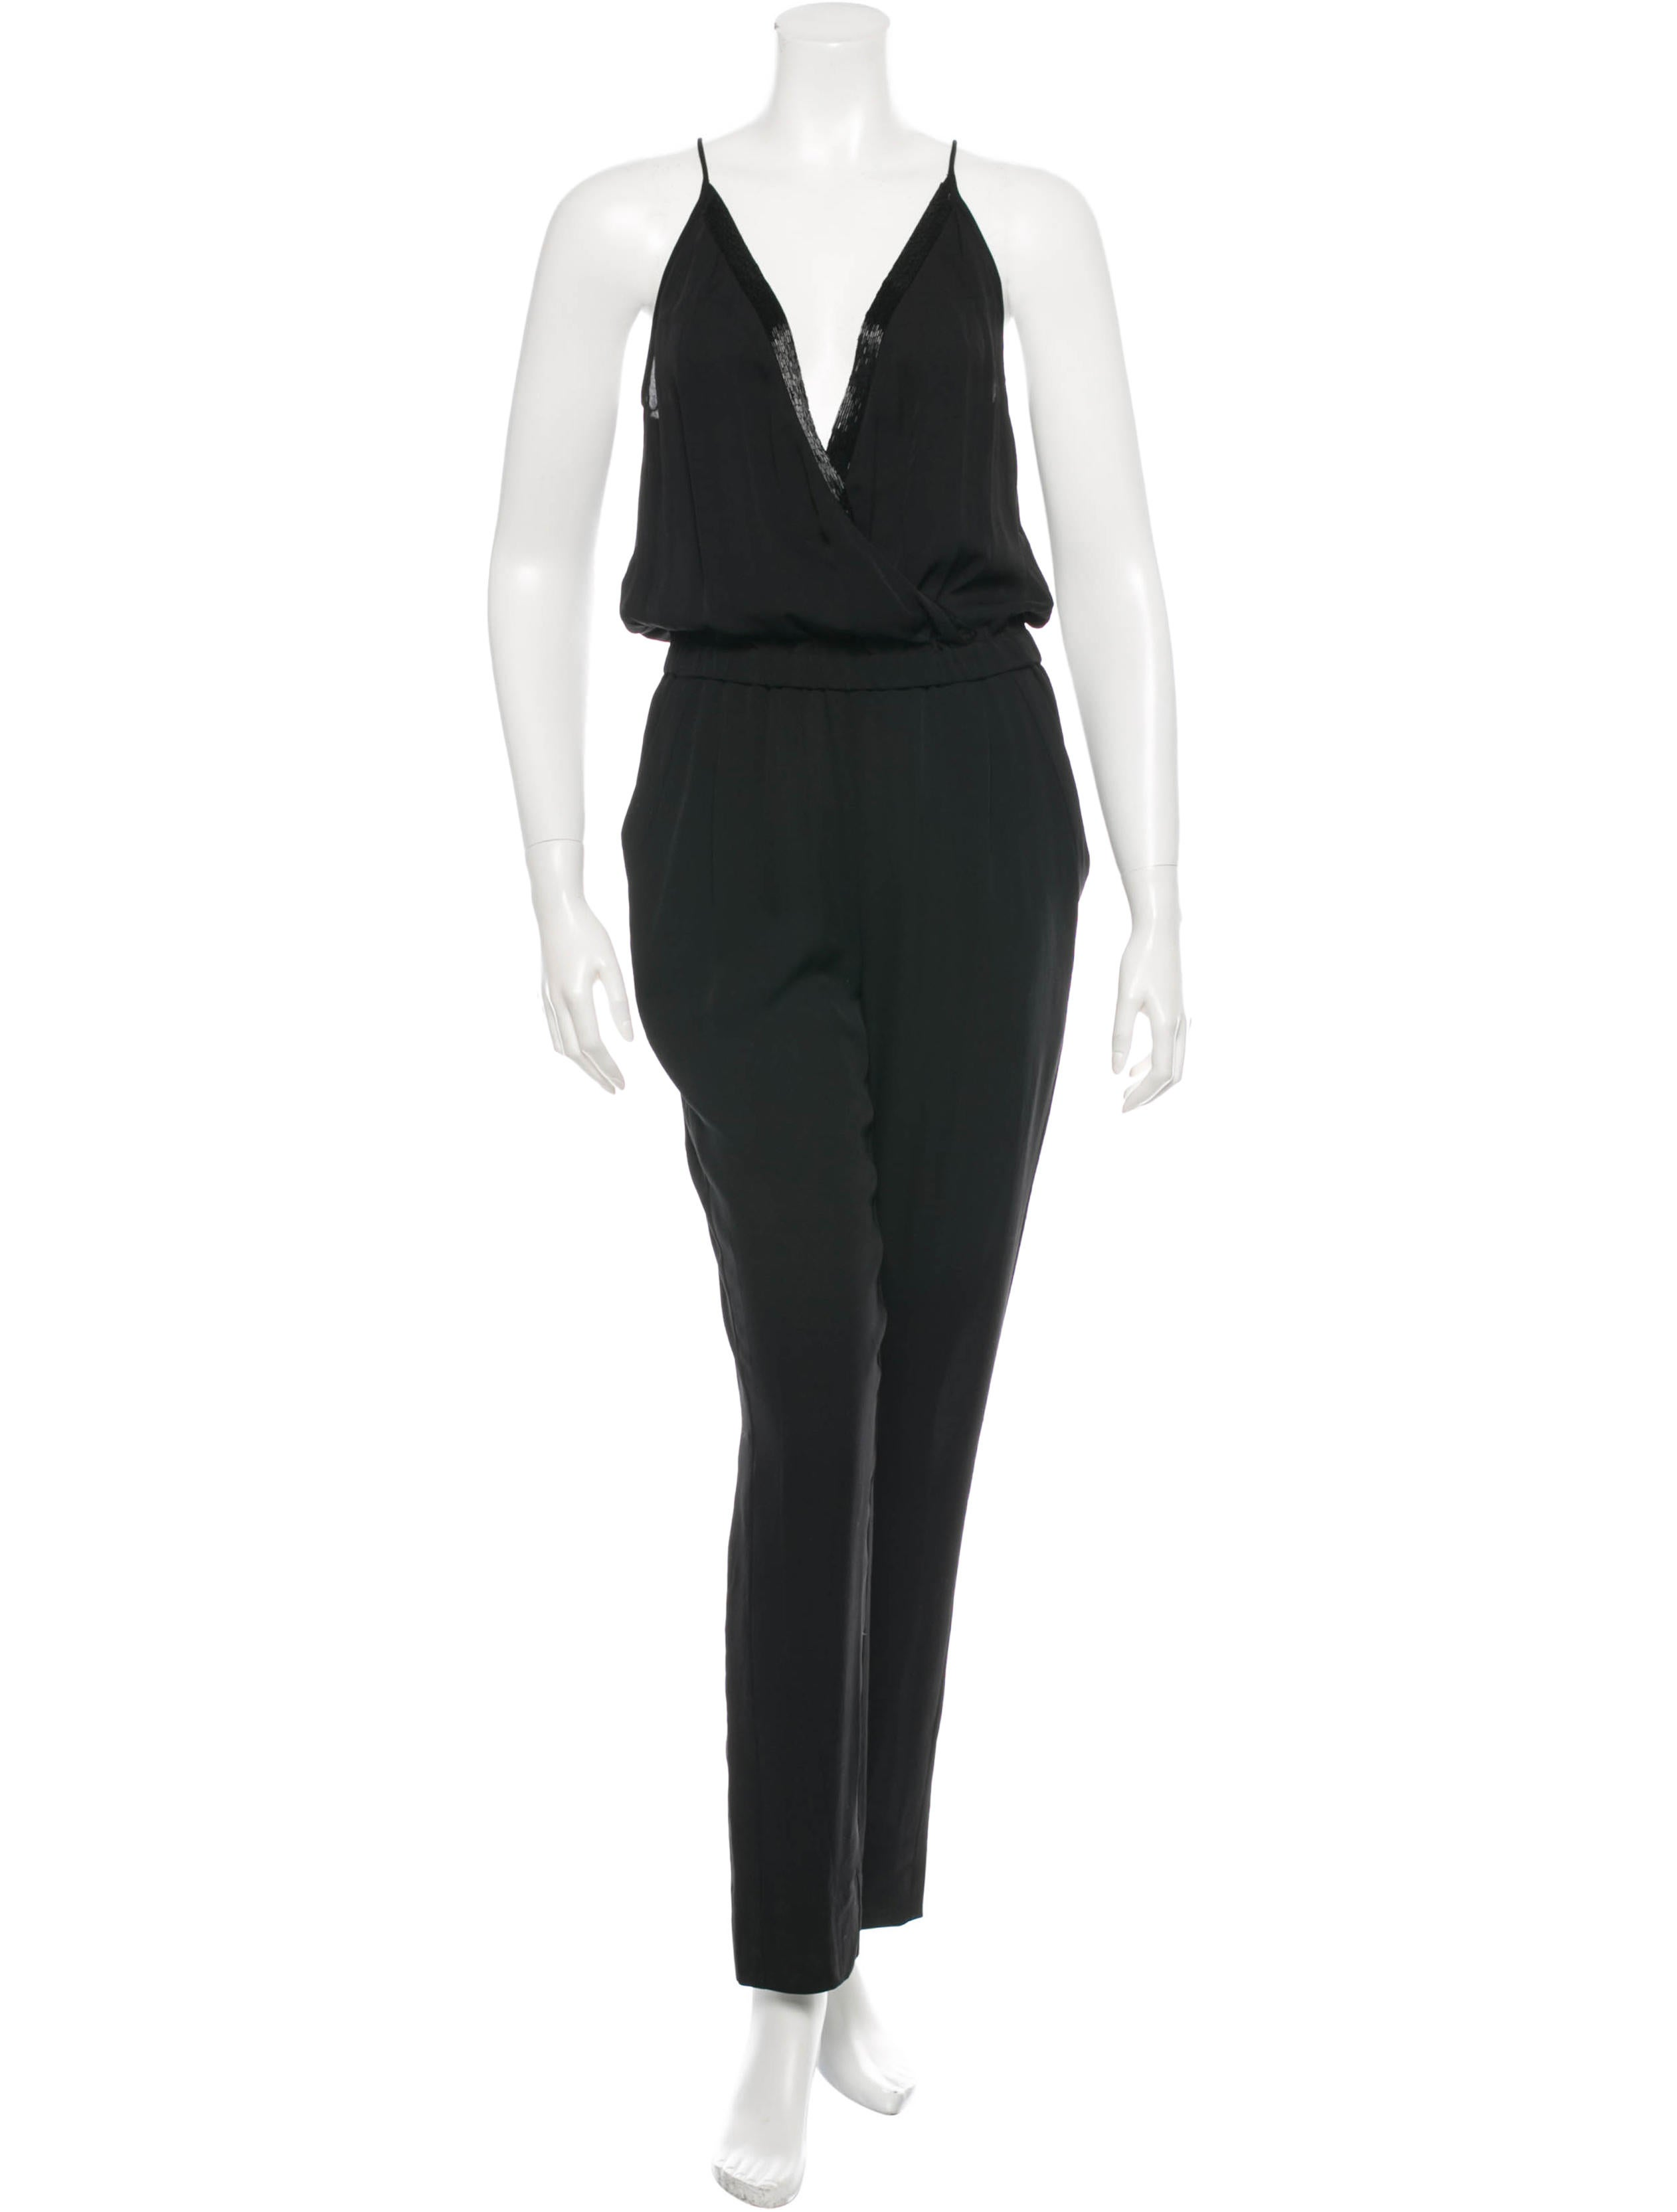 78606d0dbc7 Diane von Furstenberg Shany Embellished Jumpsuit w  Tags - Clothing ...